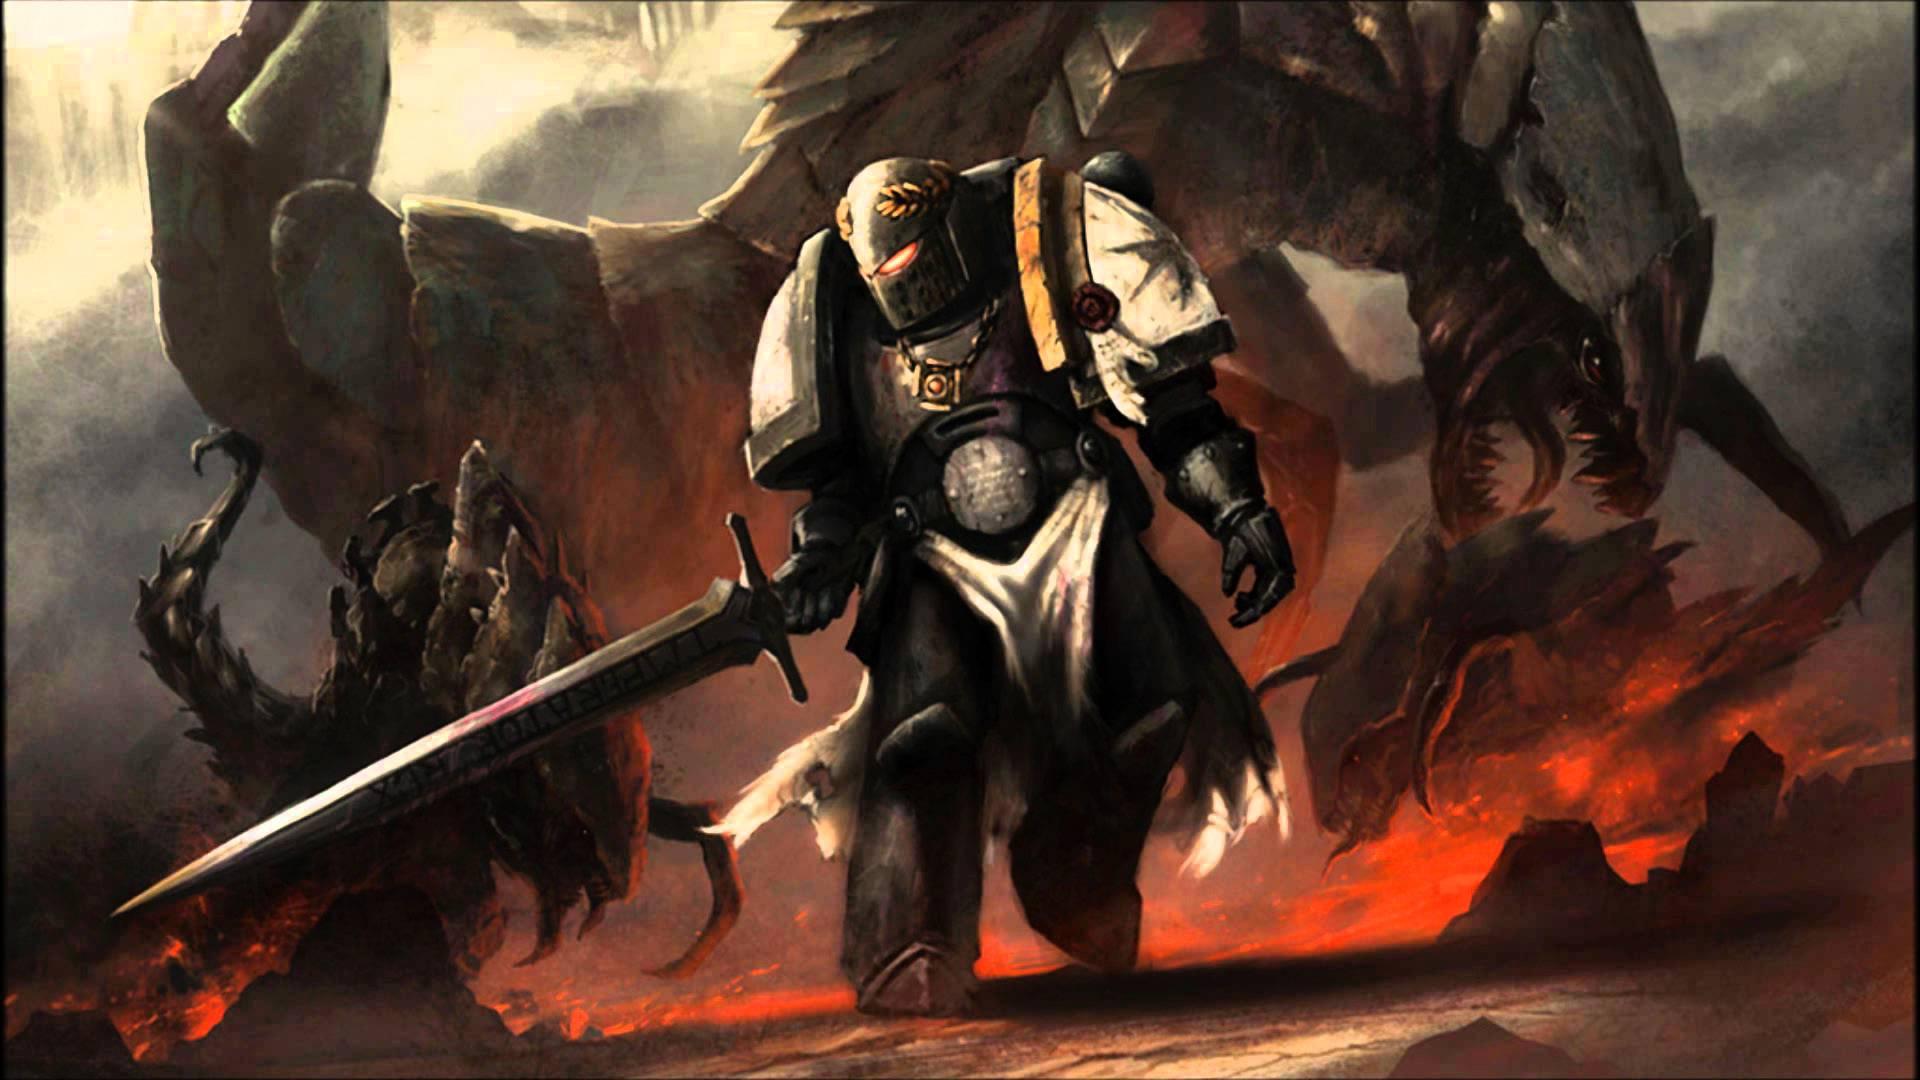 Black Templar Wallpapers Wallpaper Cave